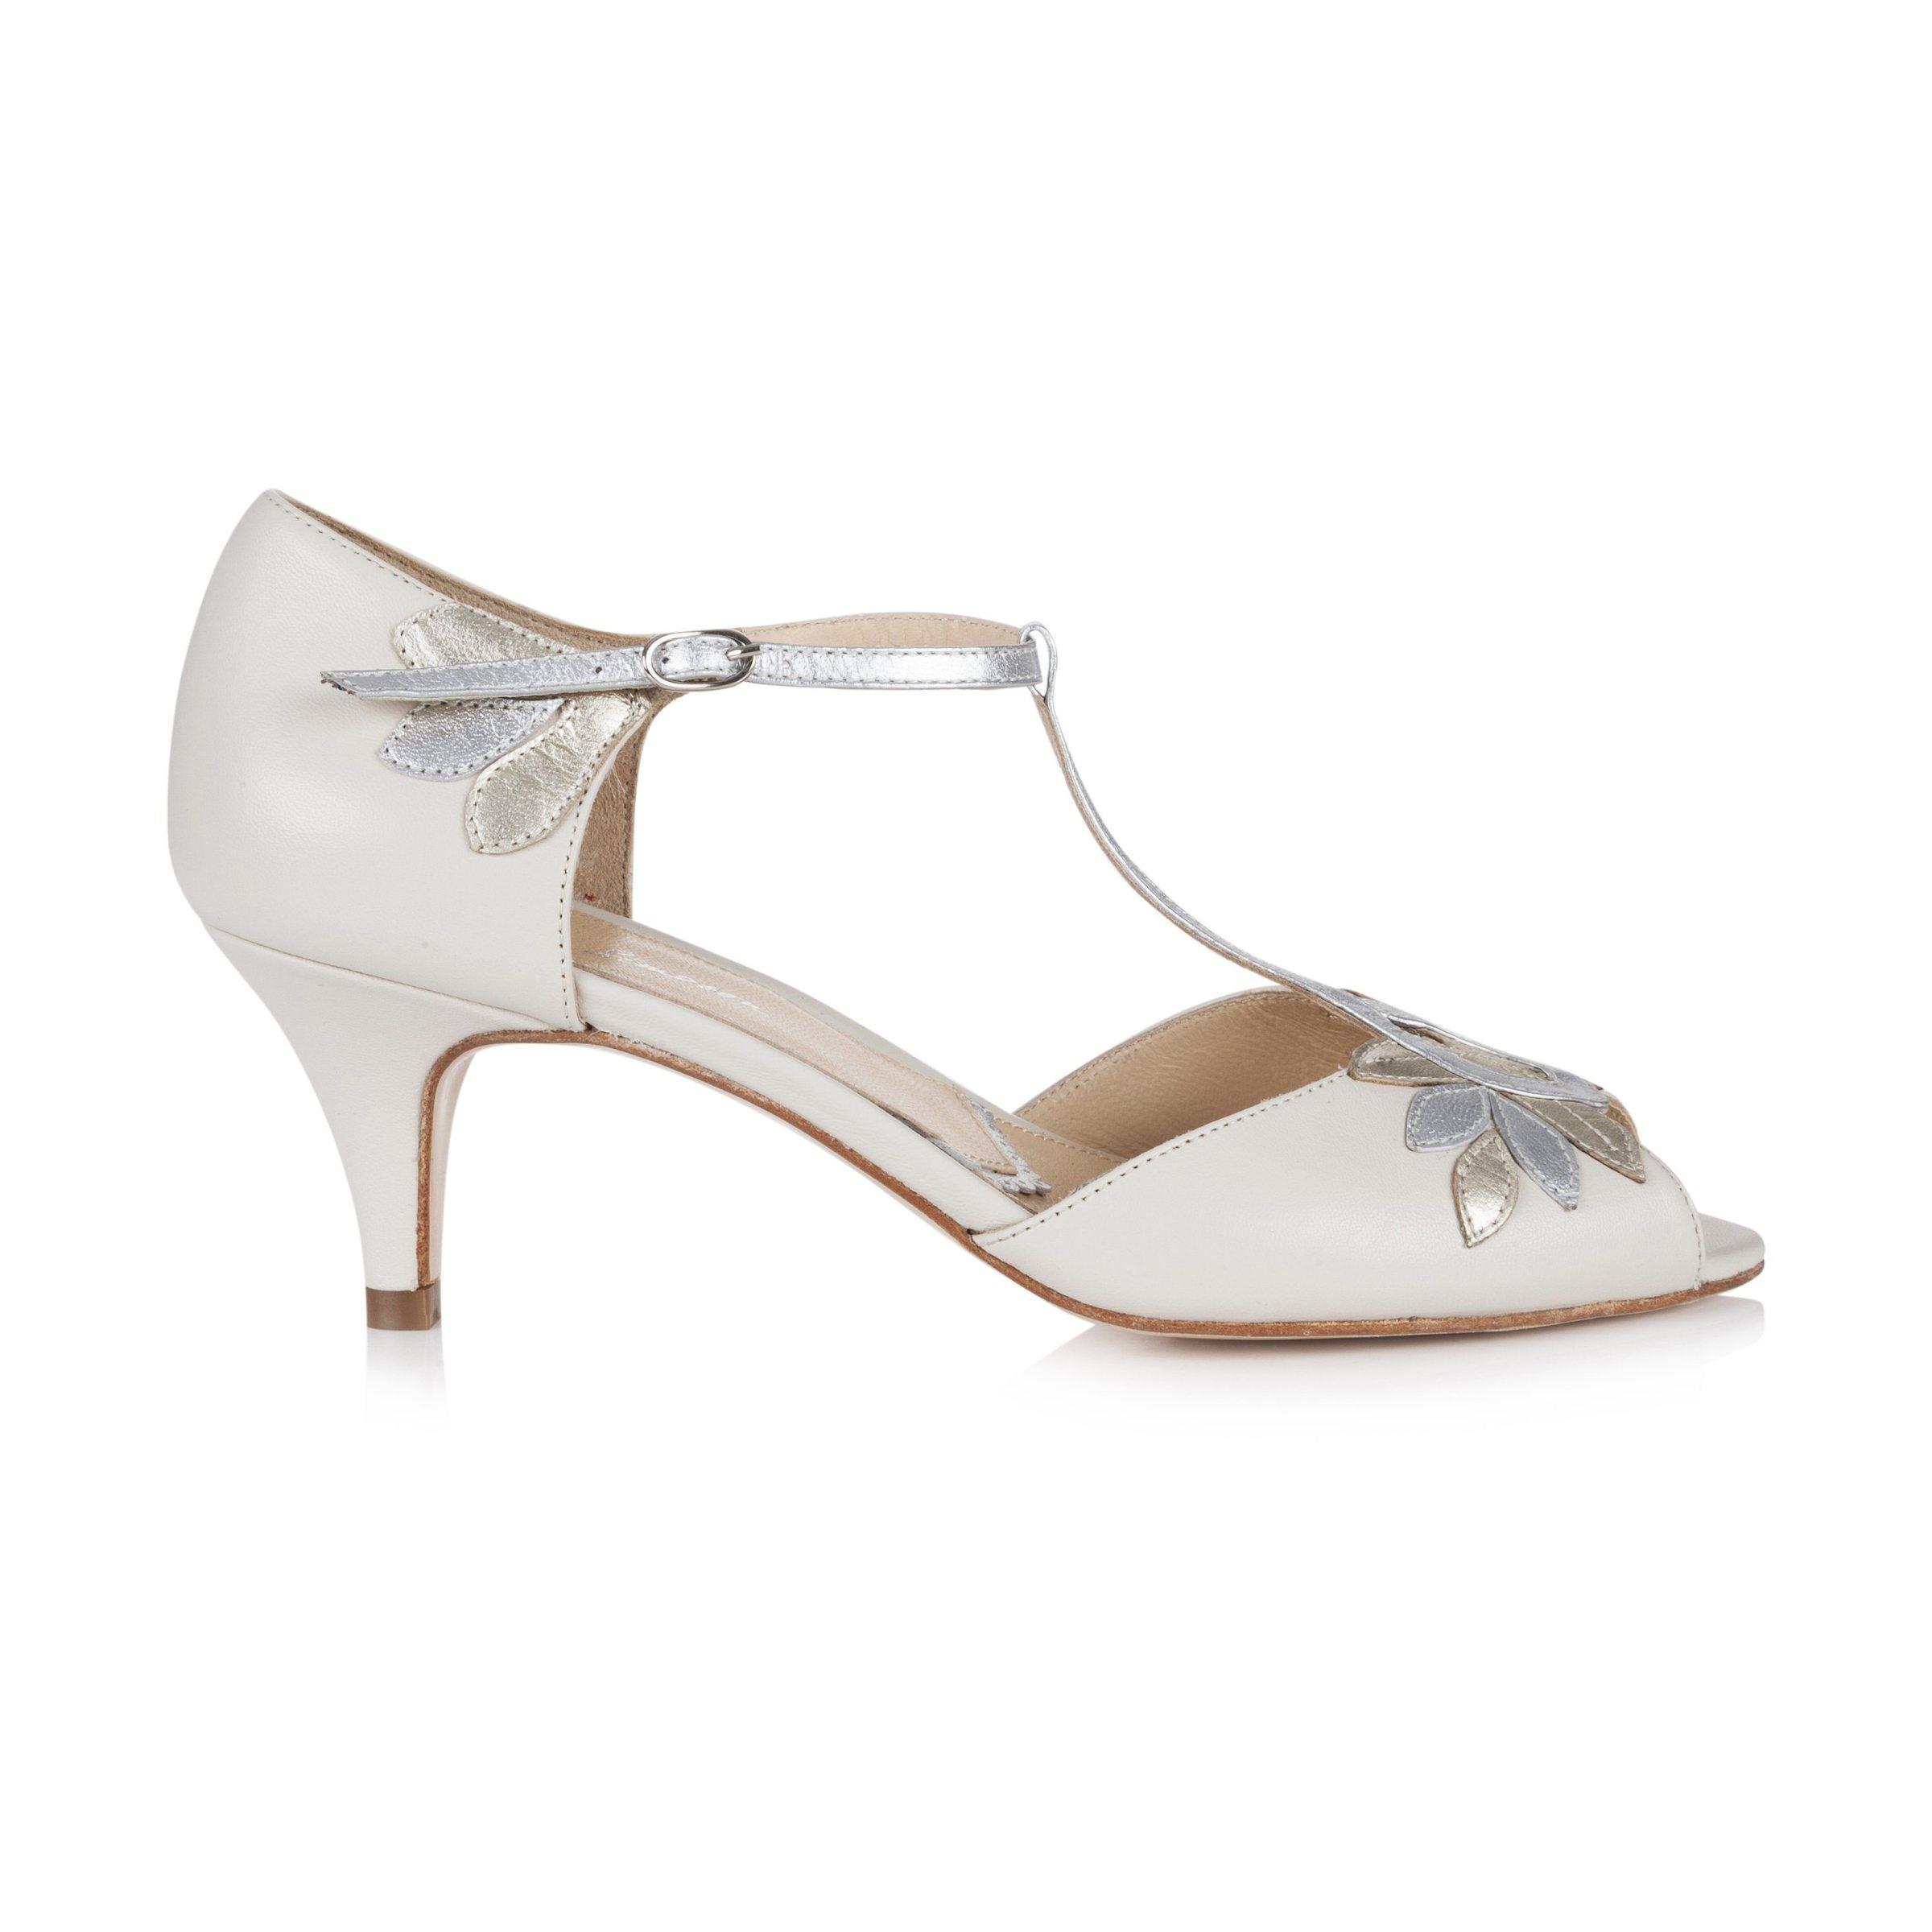 Rachel Simpson chaussures de mariee isla ivory mixed metallic chaussures mariage Elise Martimort